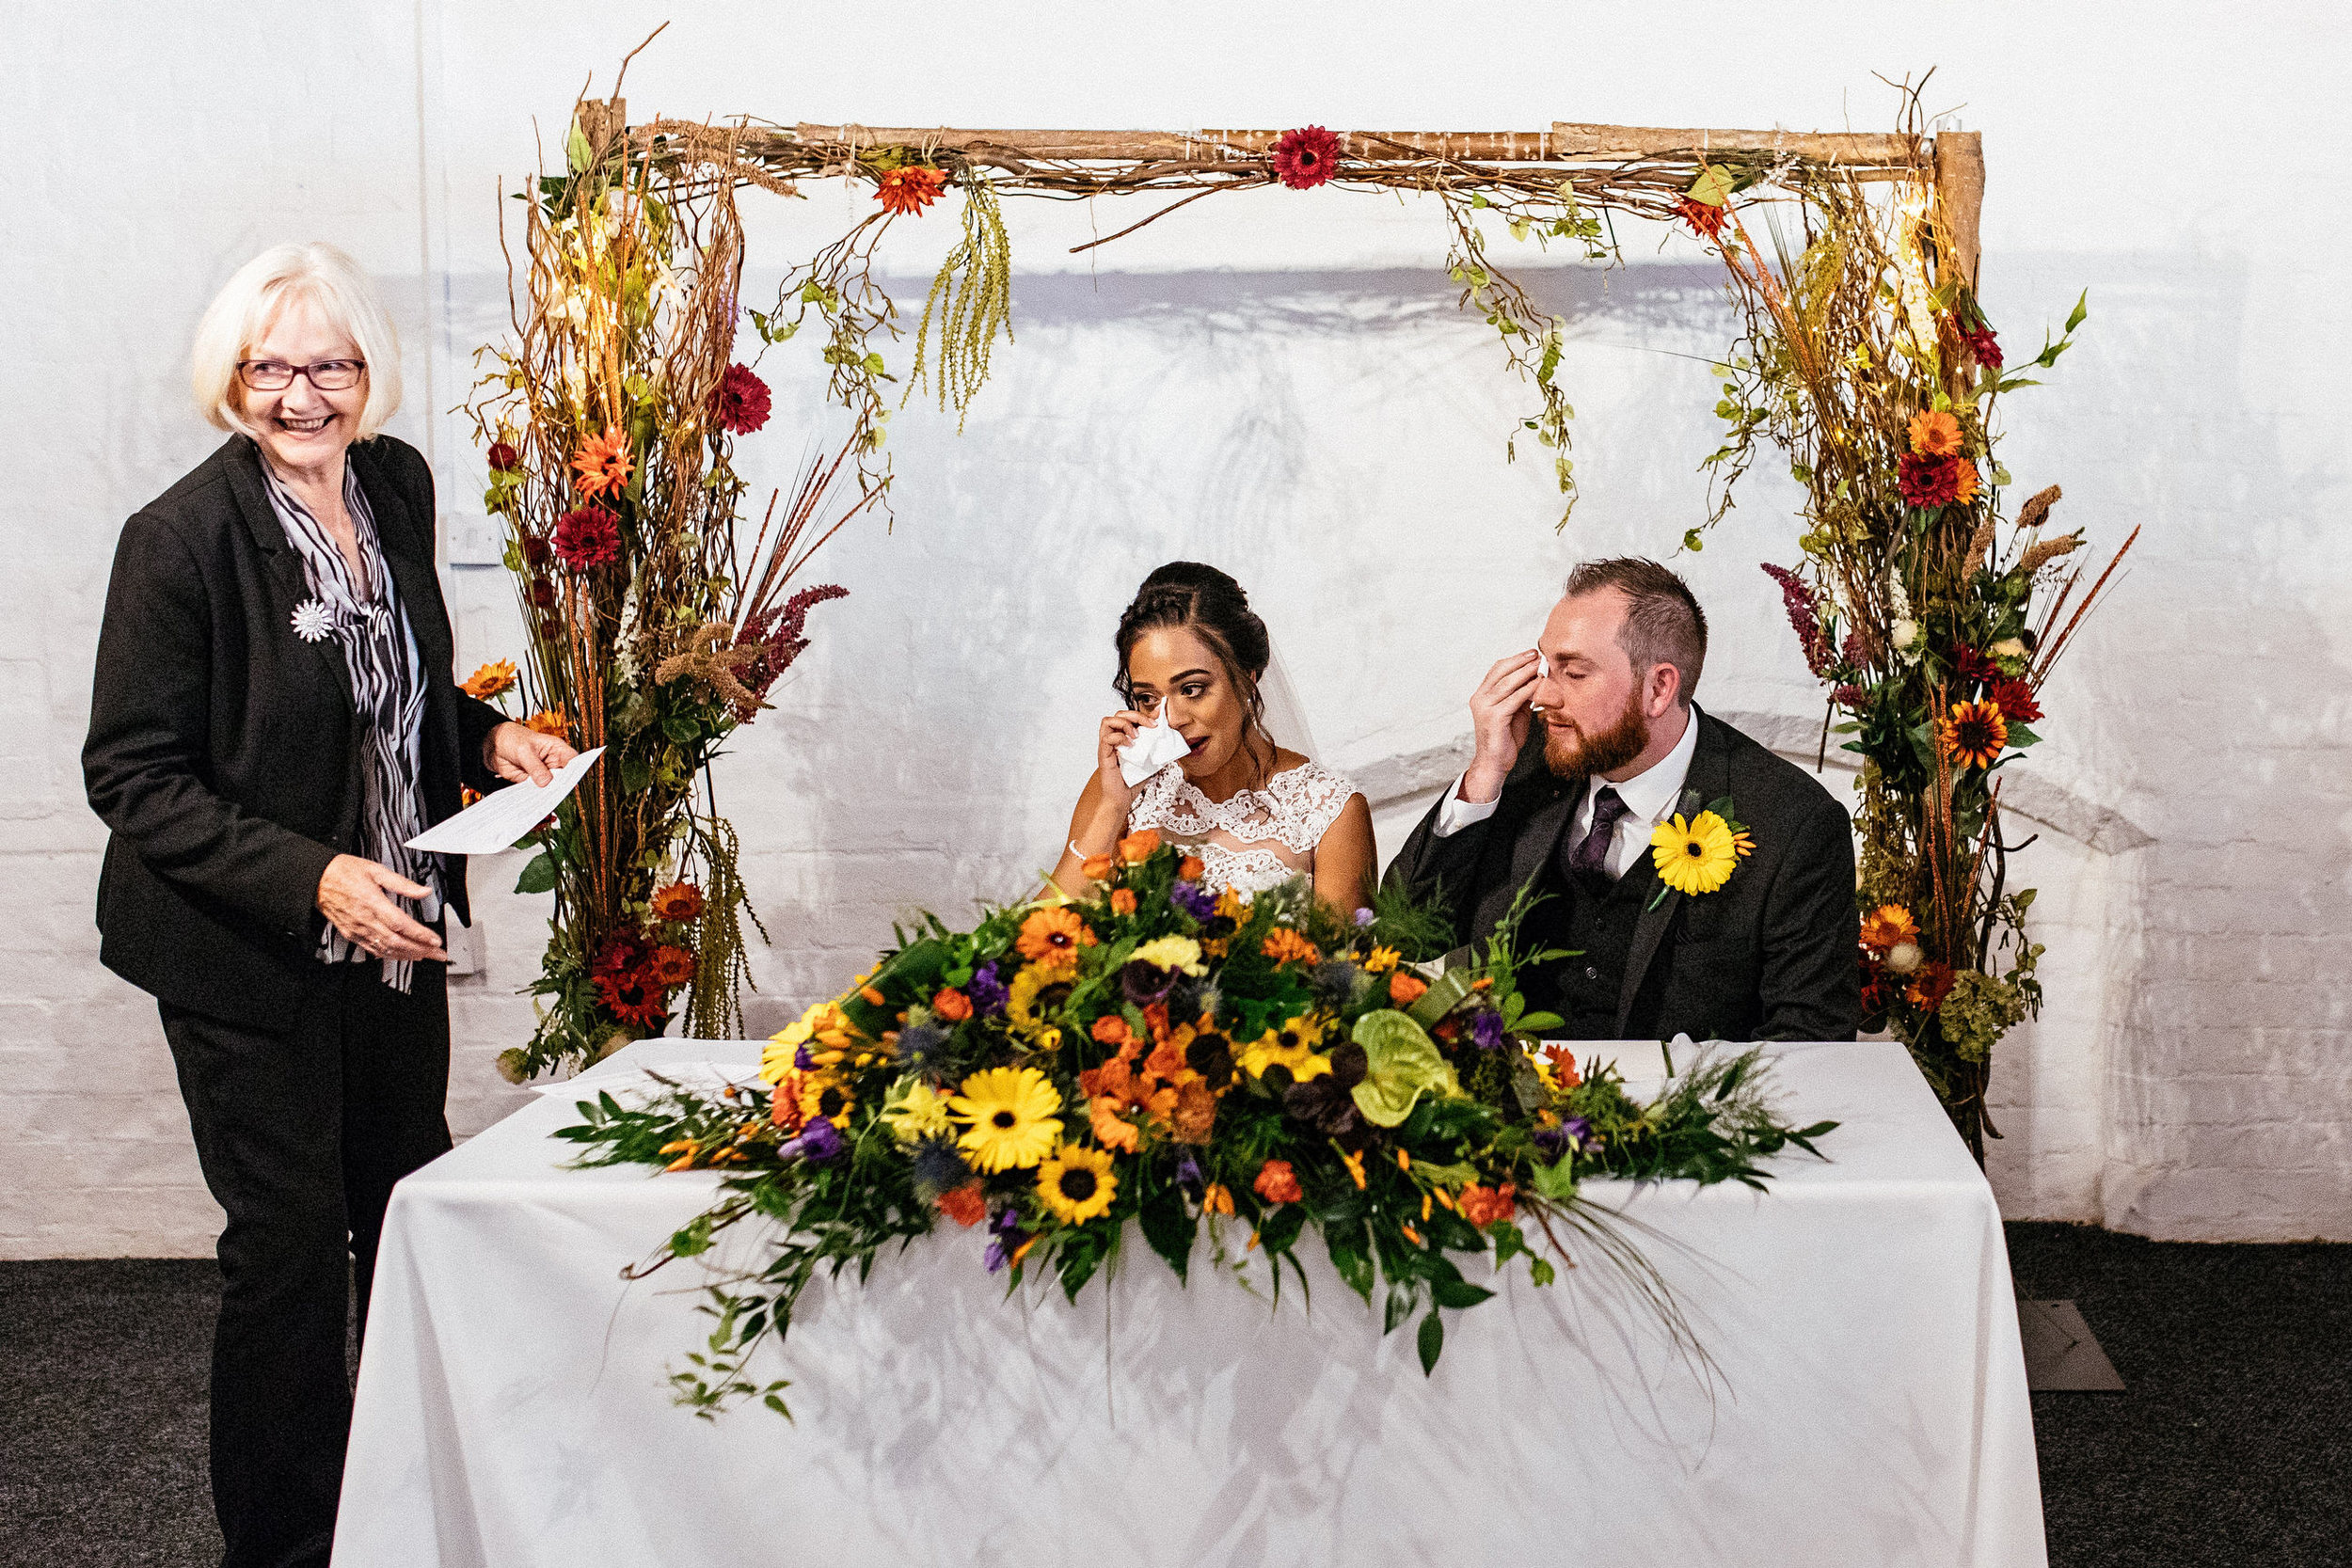 The-Bond-Company-Wedding-Photography-43-1.jpg